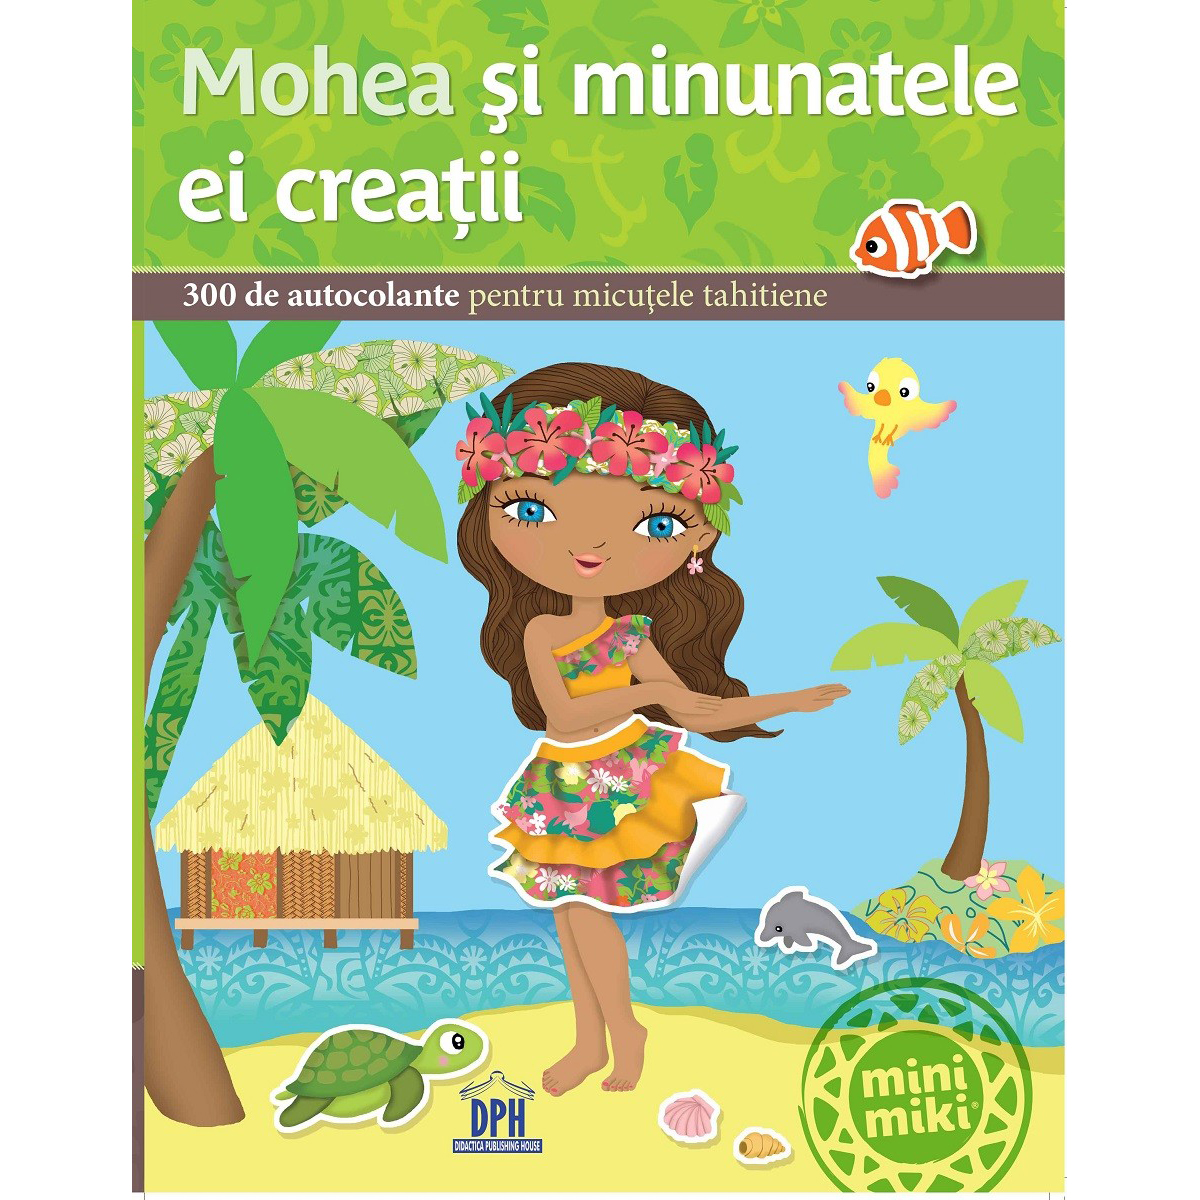 Carte Mohea si minunatele ei creatii, Editura DPH